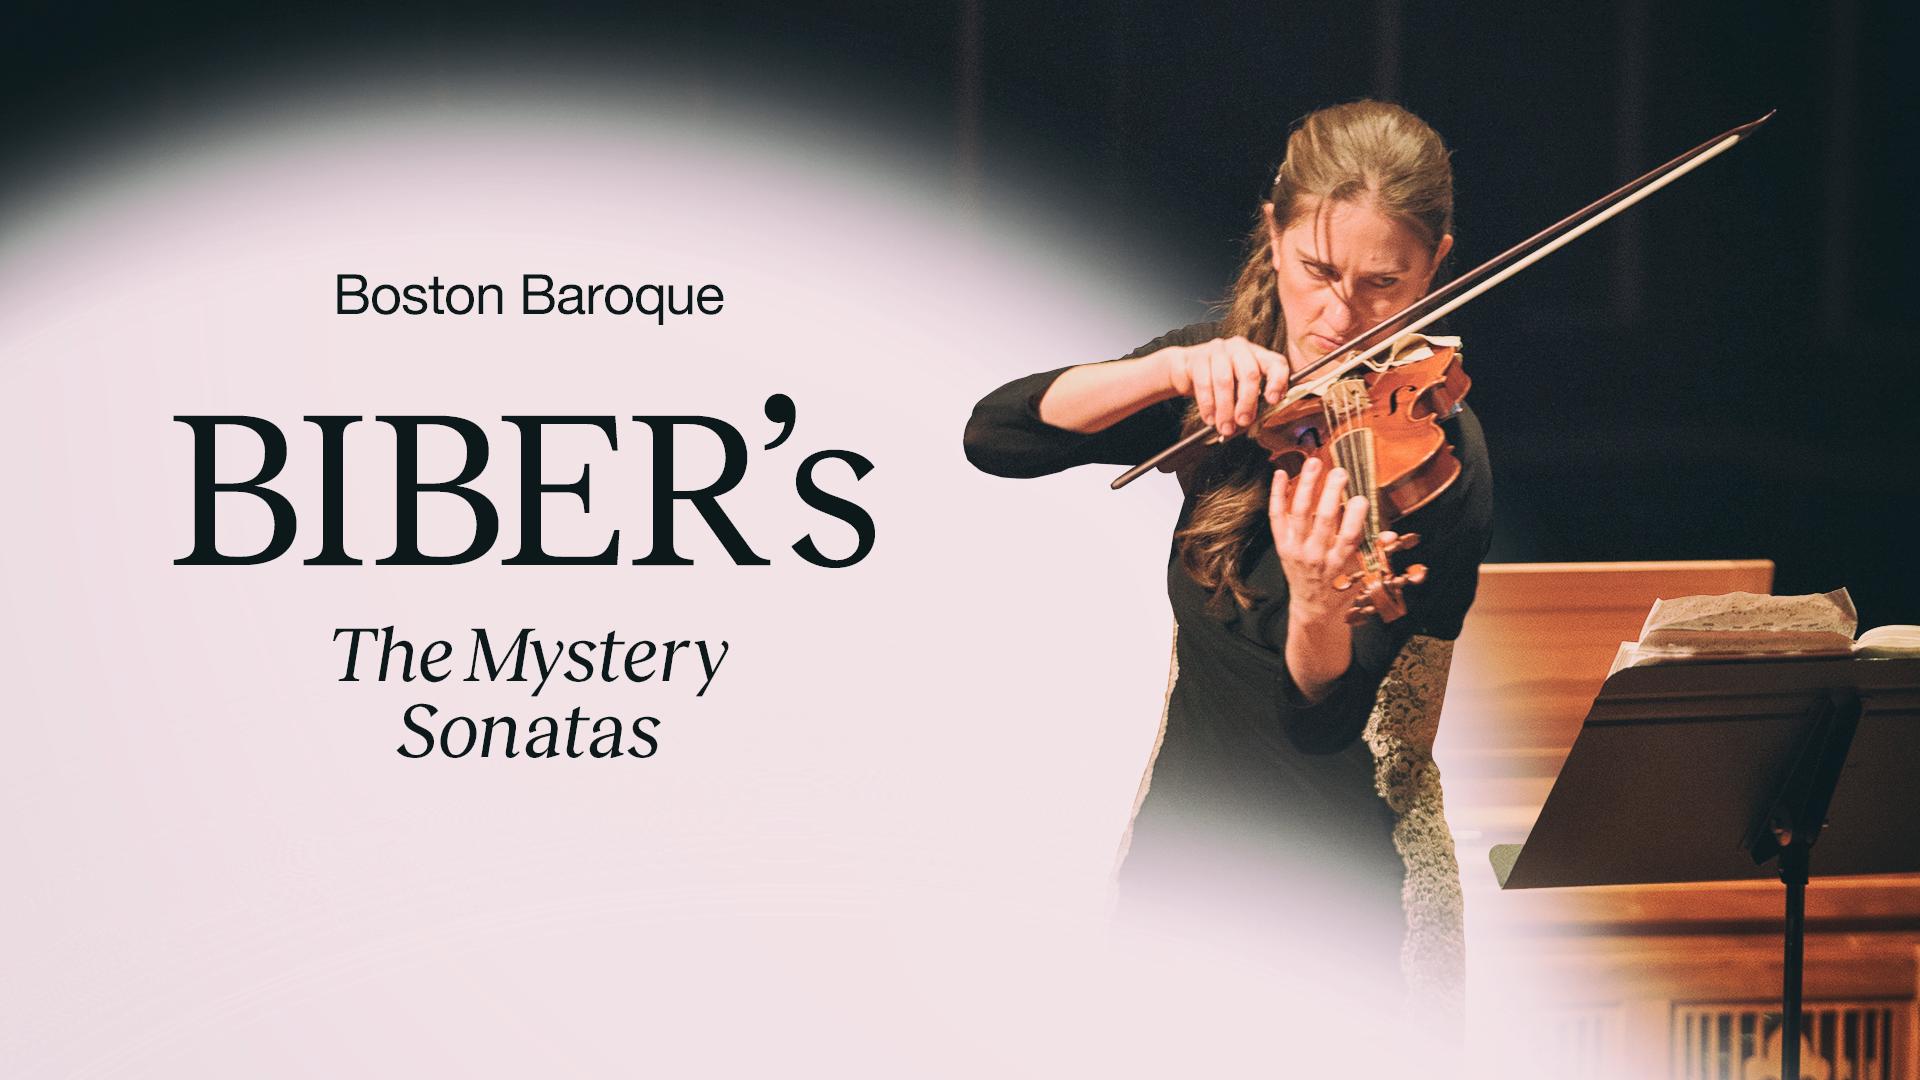 Biber's The Mystery Sonatas